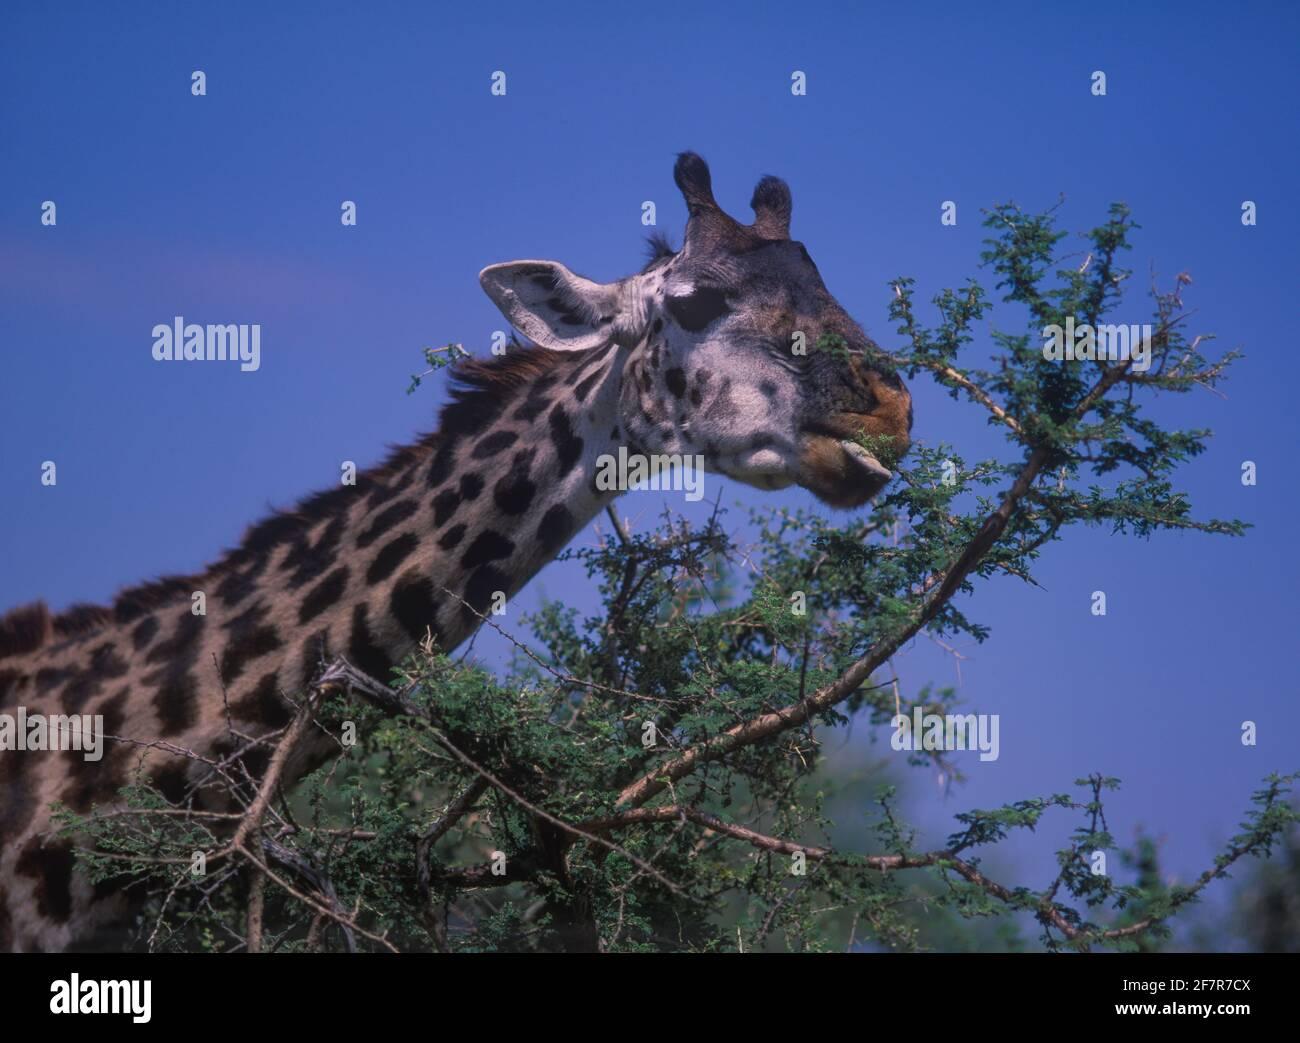 Masai giraffe, Giraffa camelopardalis tippelskirchi. Eating acacia tree leaves. Note purplish-black prehensile tongue; that is useful for grasping Stock Photo